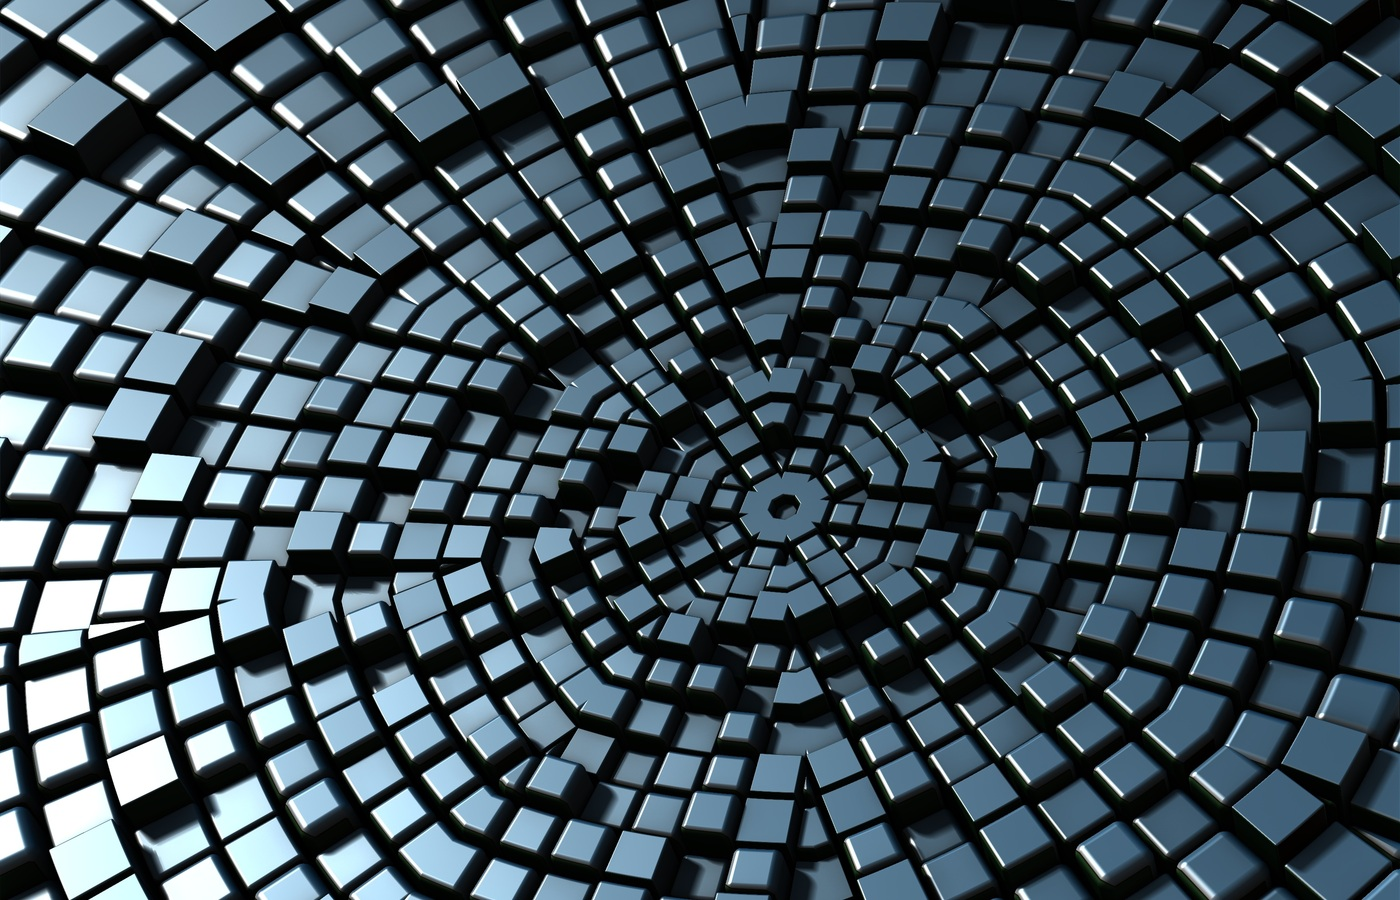 artistic-cube-digital-art-pattern-4k-zh.jpg